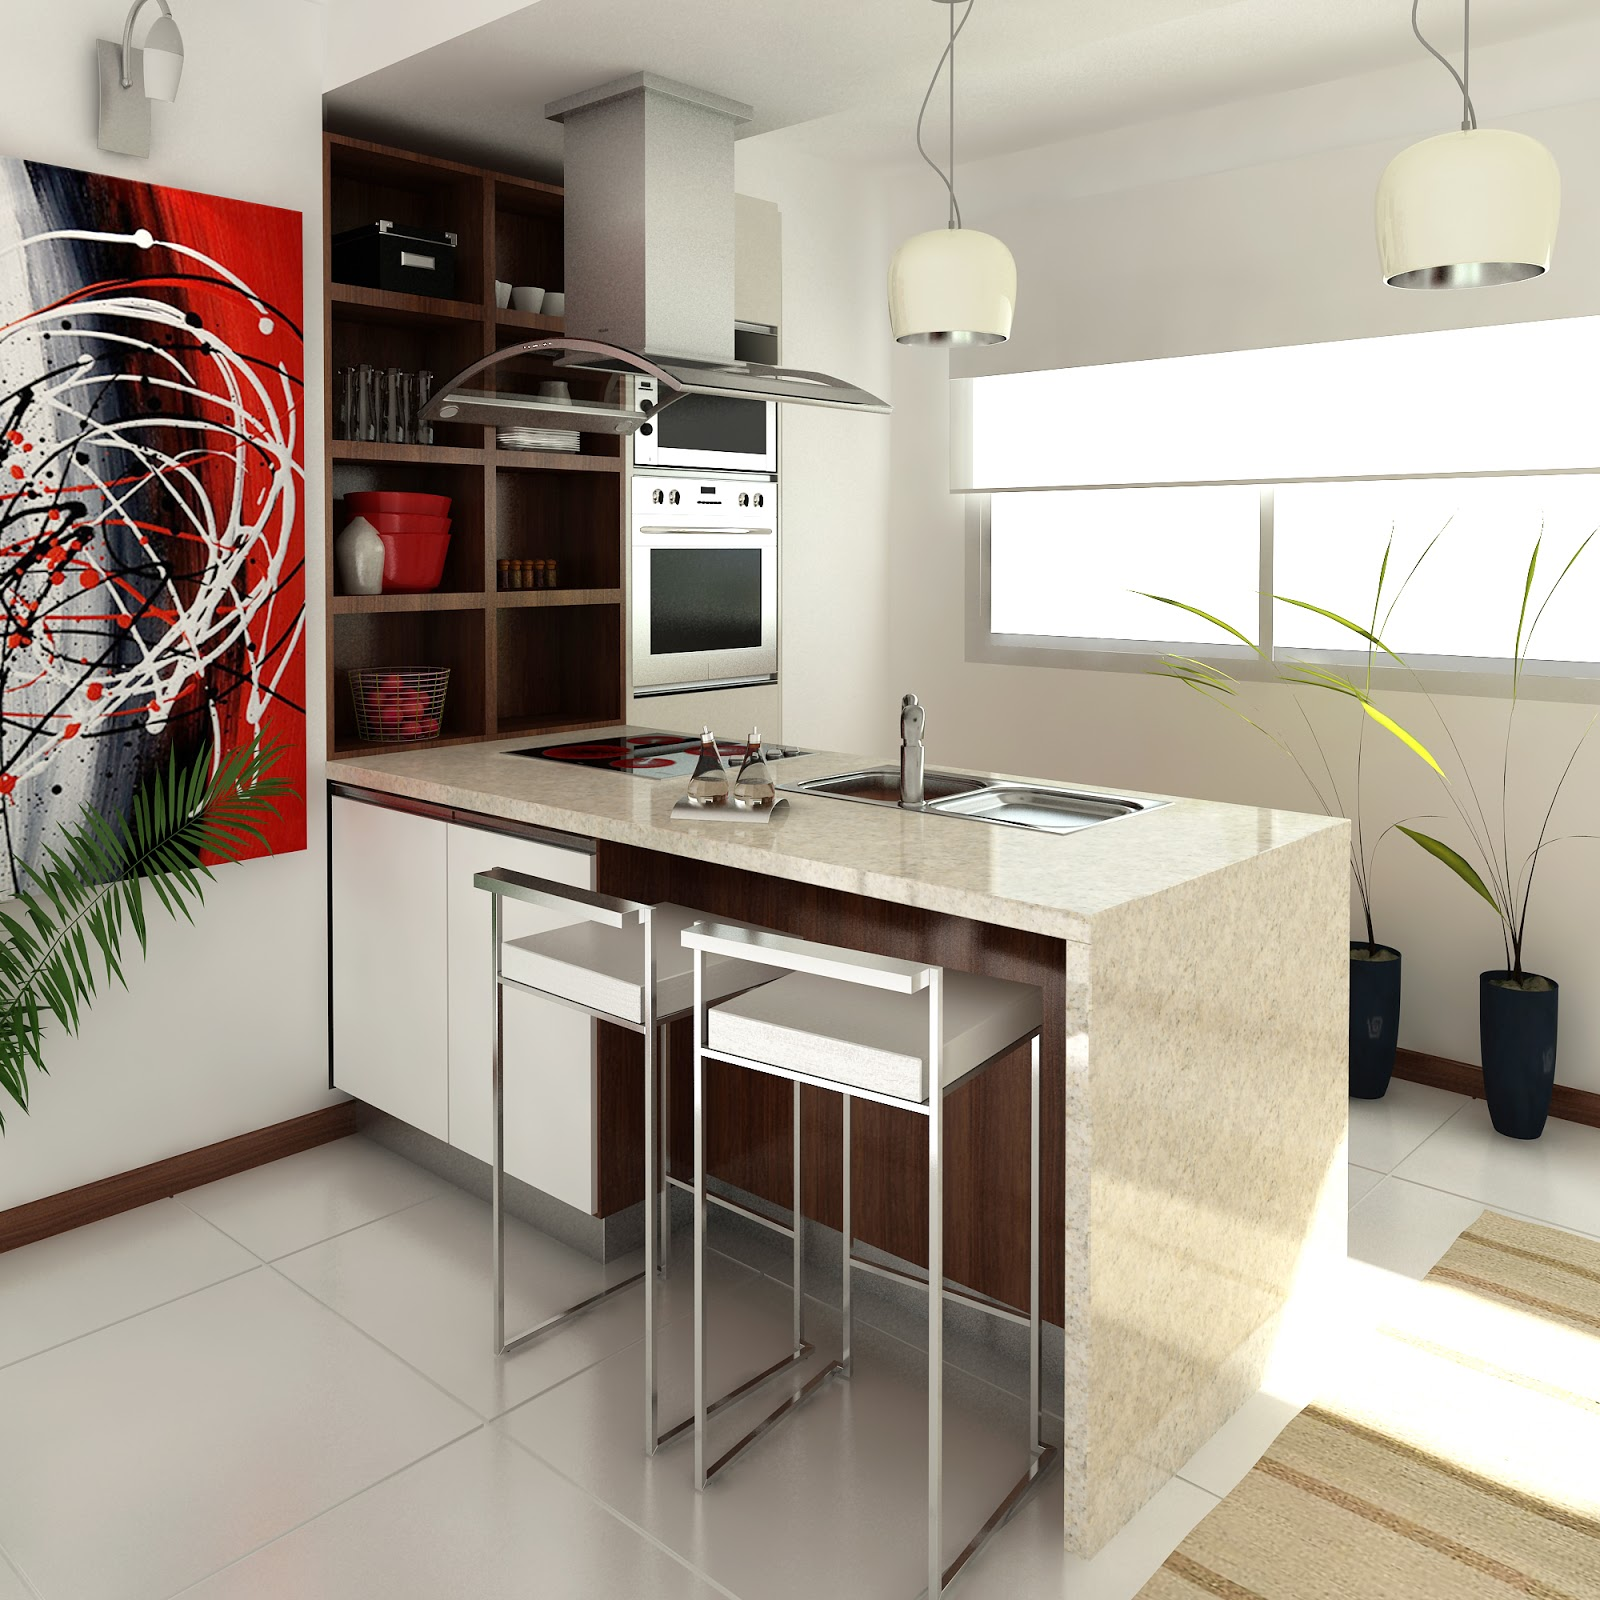 Arquitectura en im genes 3d dise o de interiores cocinas for Diseno de interiores cocinas pequenas